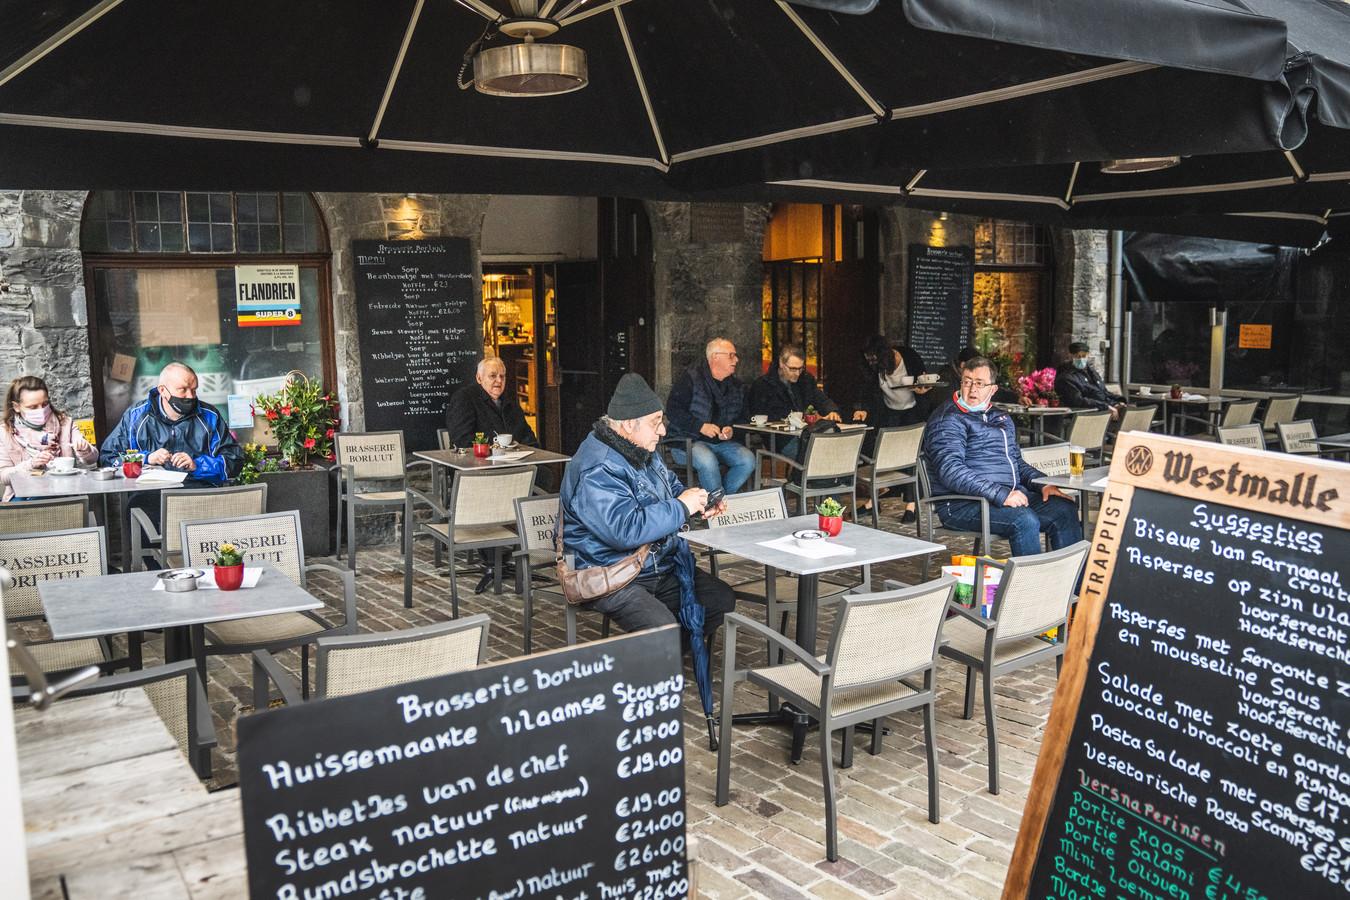 Het terras van brasserie Borluut liep om 8u40 al aardig vol